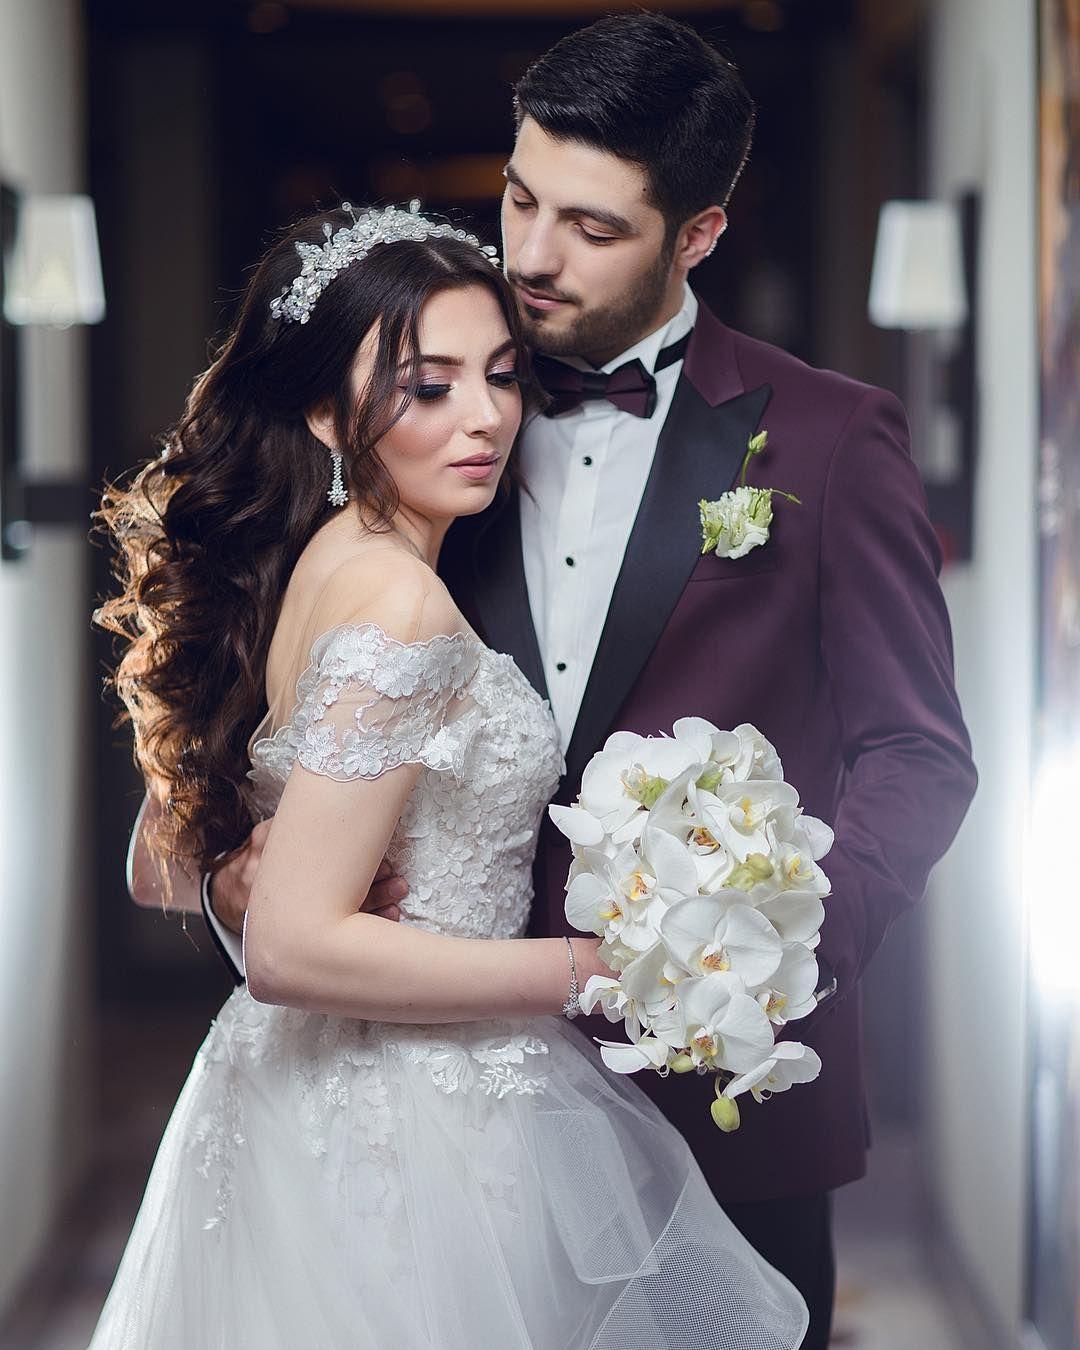 Pin By Munisa On Svadebnye Fotografii Beautiful Couple Cute Couples Wedding Dresses